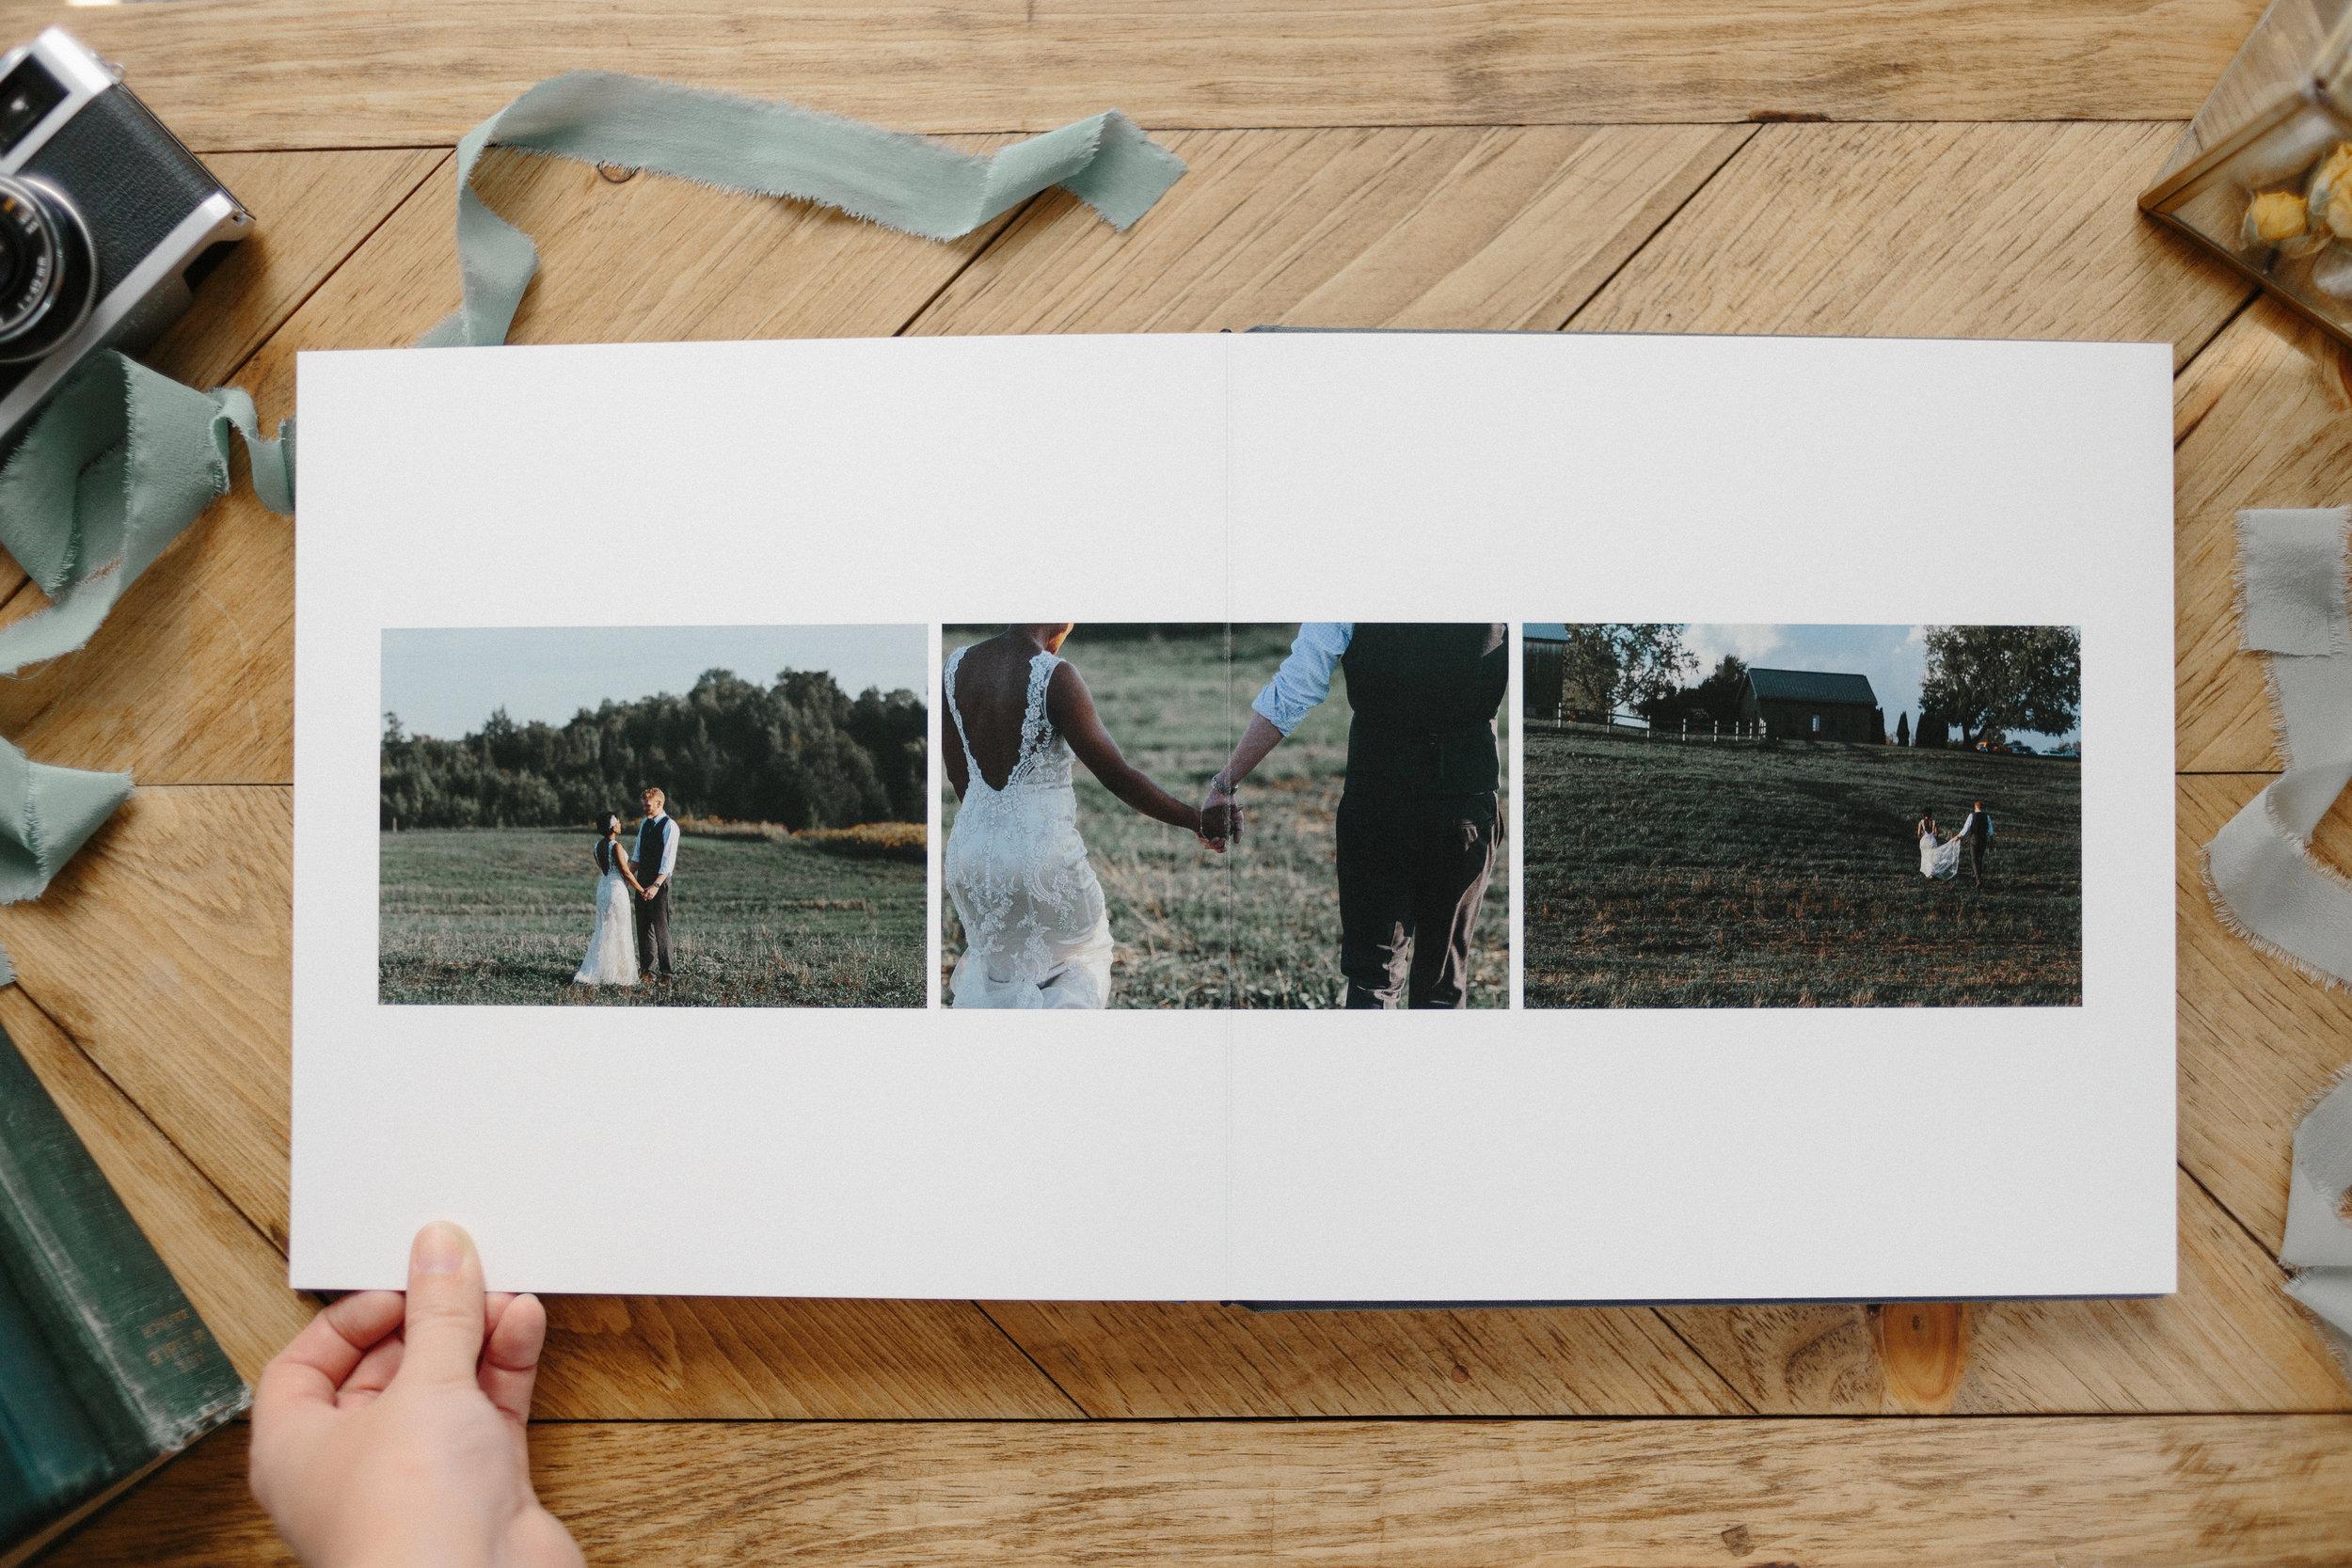 ryanne-hollies-photography-wedding-album-design-details-tono-and-co-artifact-uprising-63.jpg